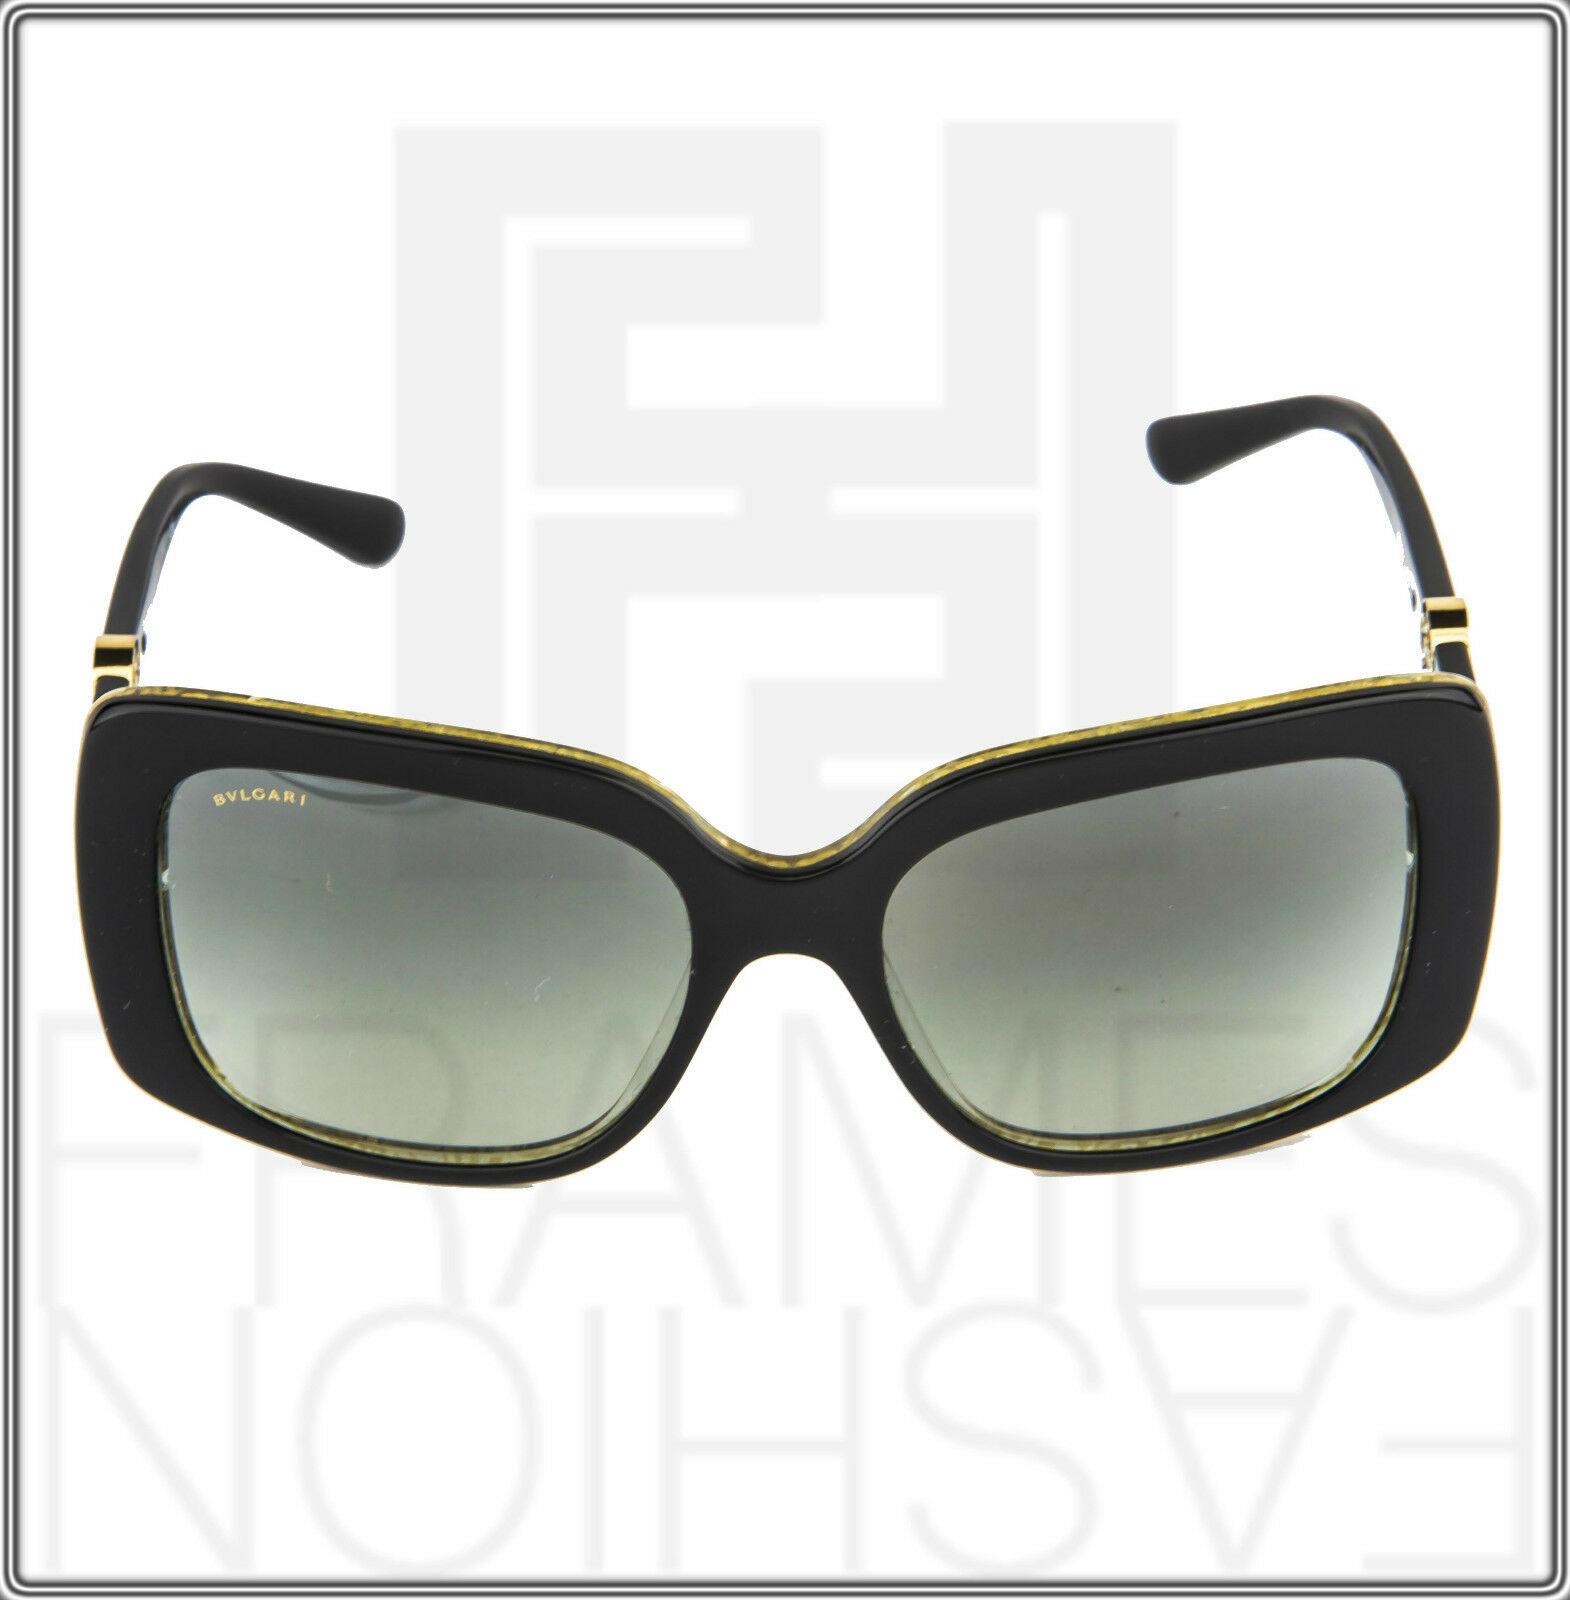 BVLGARI INTARSIO 8146B 5325/11 Black Gold Sunglasses 8146 Square Women Gradient image 7